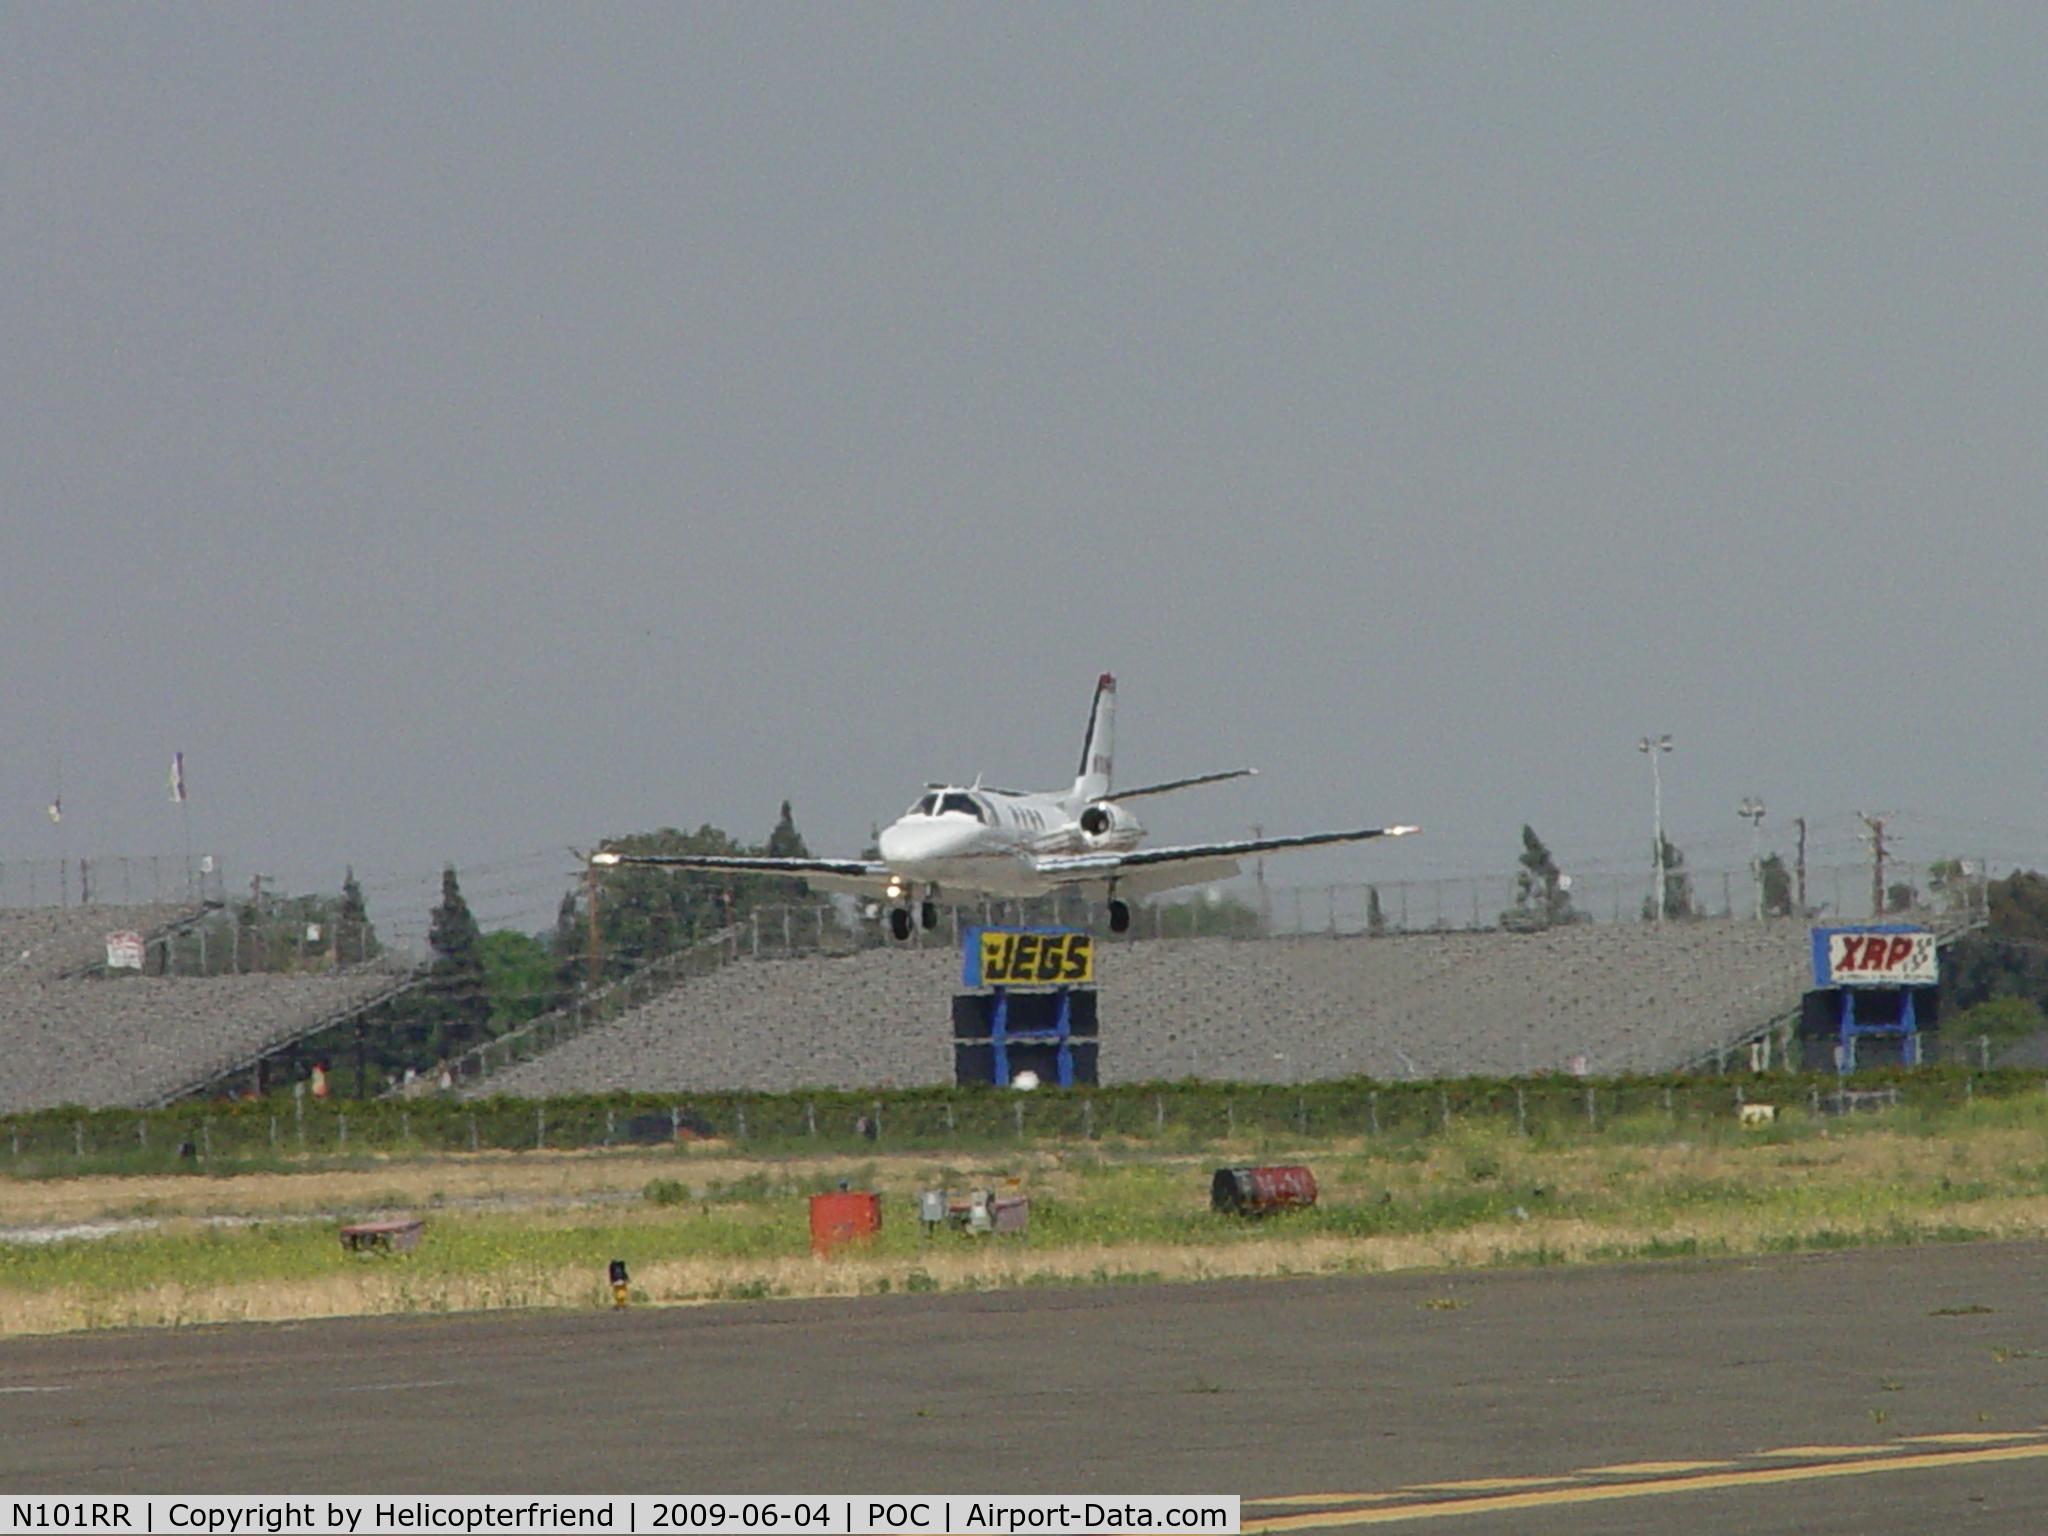 N101RR, 1982 Cessna 501 Citation I/SP C/N 5010241, Landing on 26L at Brackett